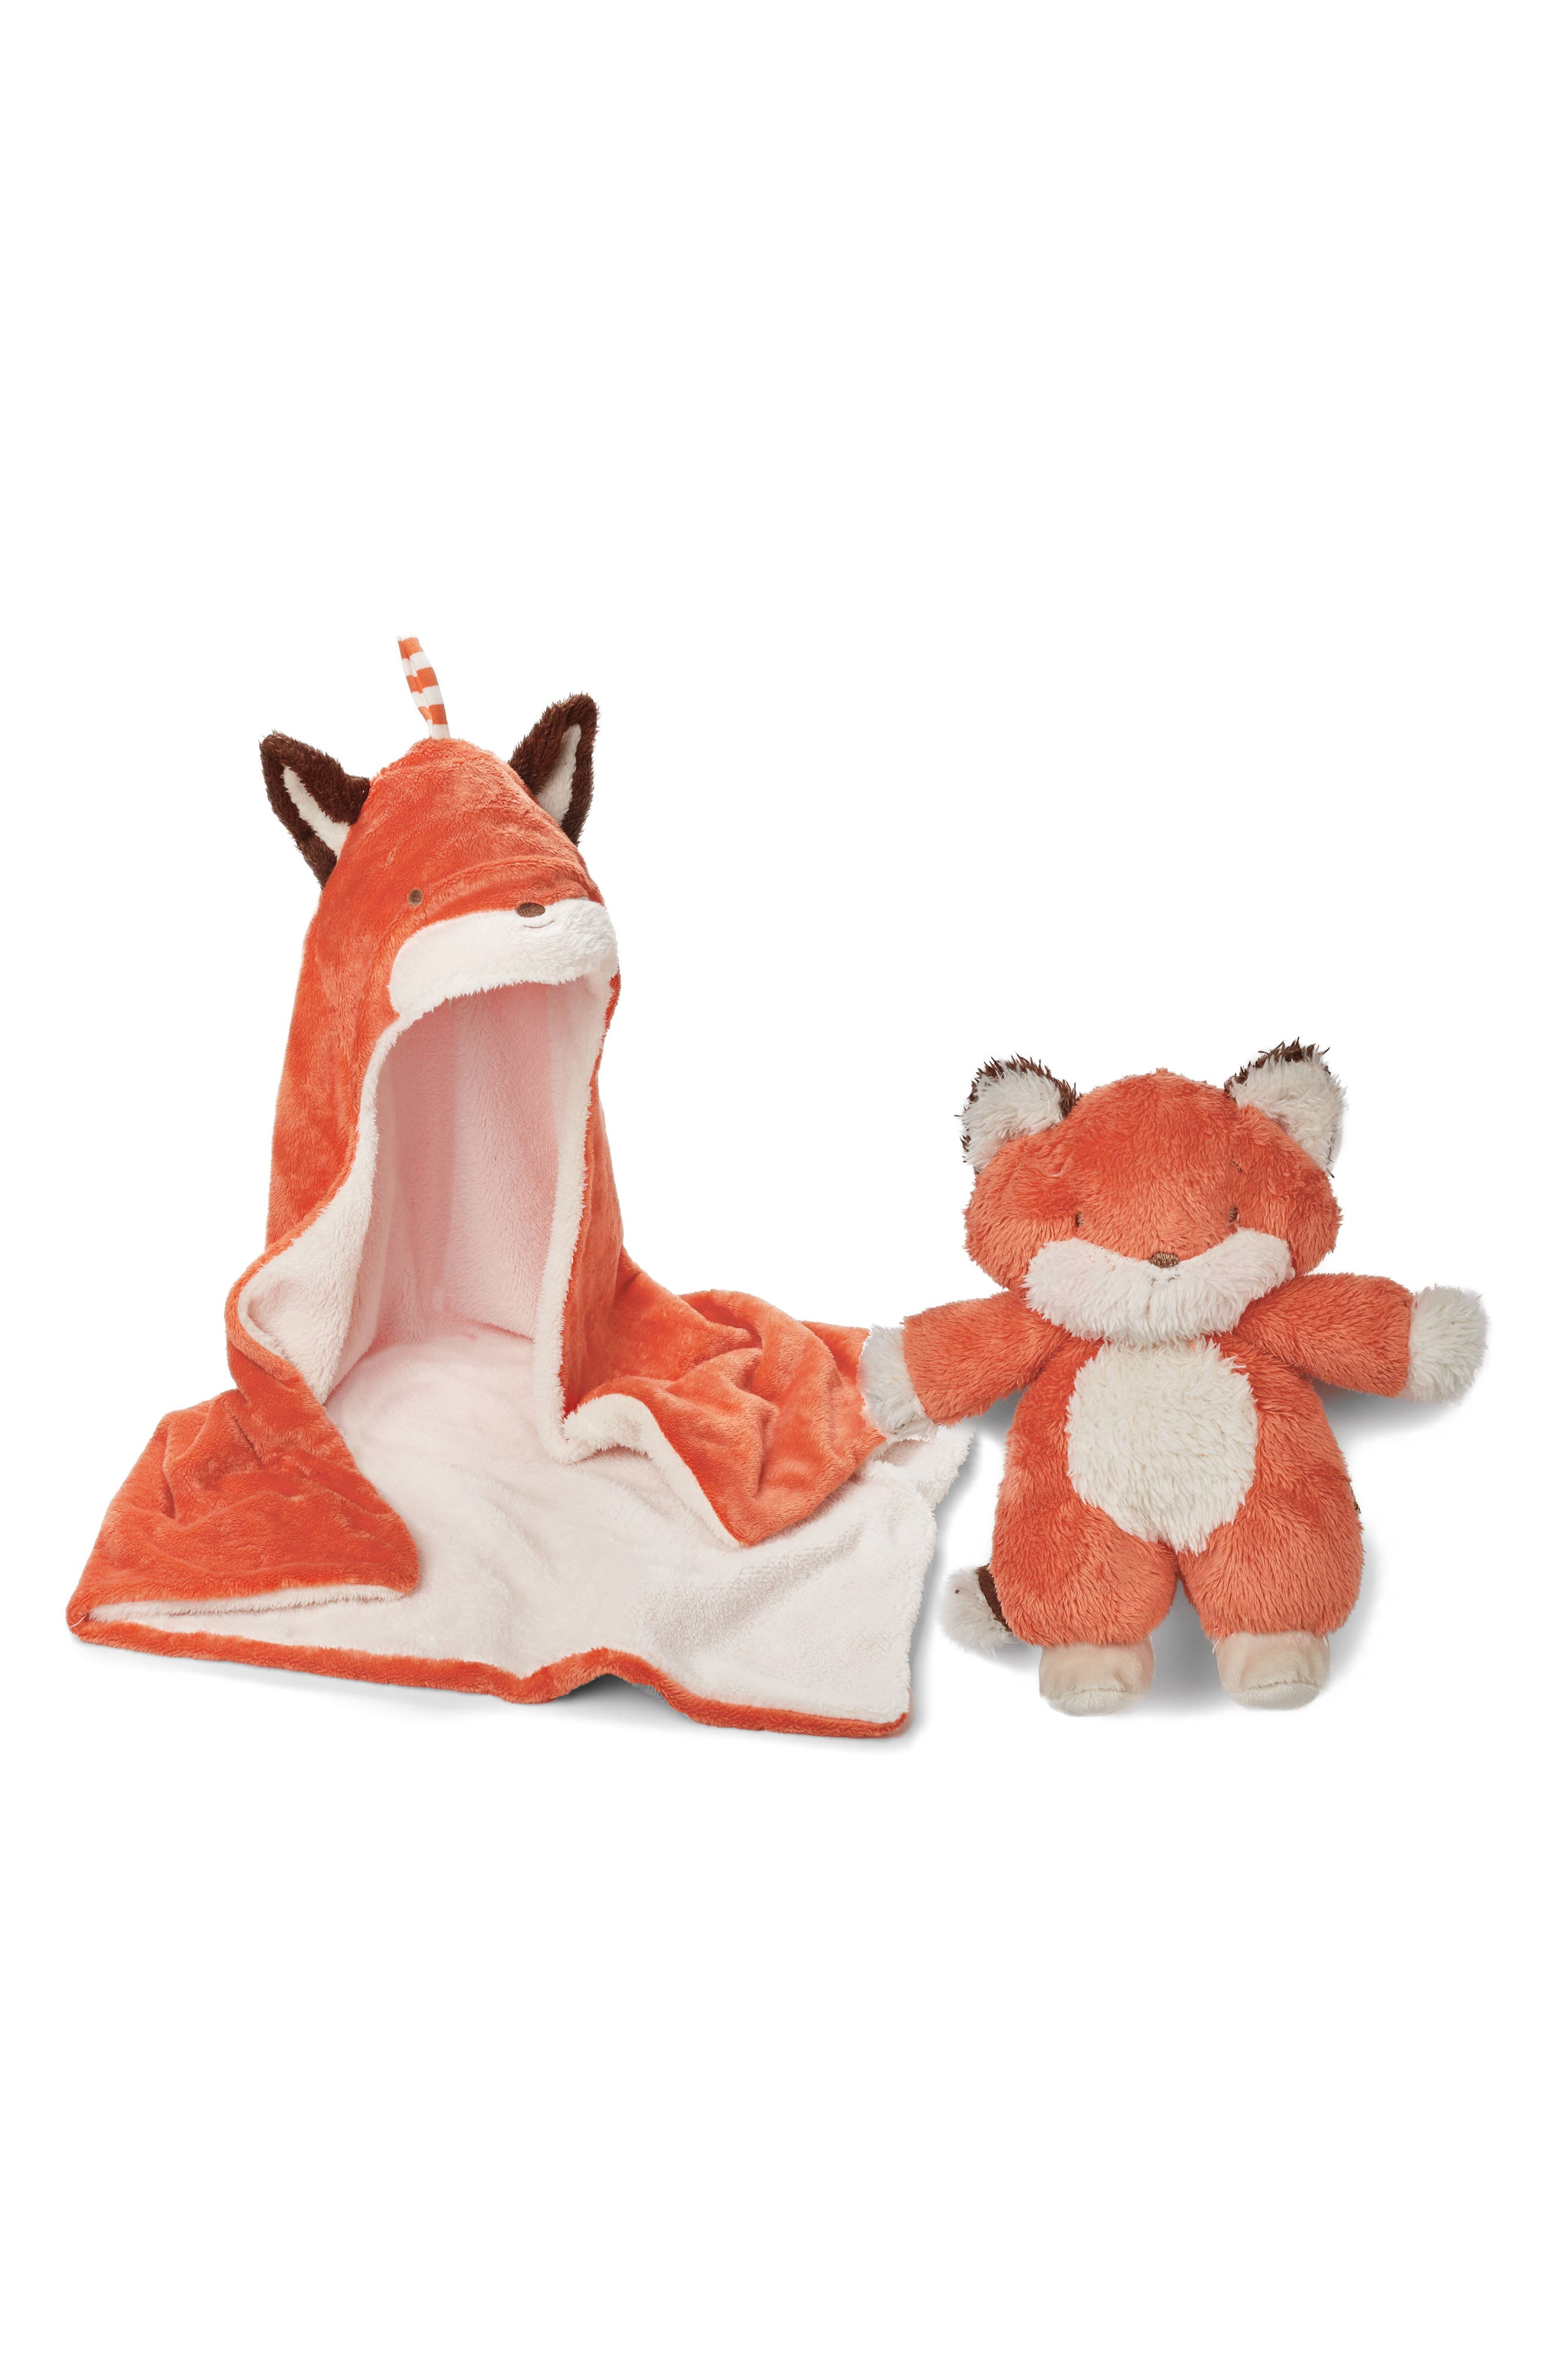 Main Image - Bunnies by the Bay Blanket & Stuffed Animal Set